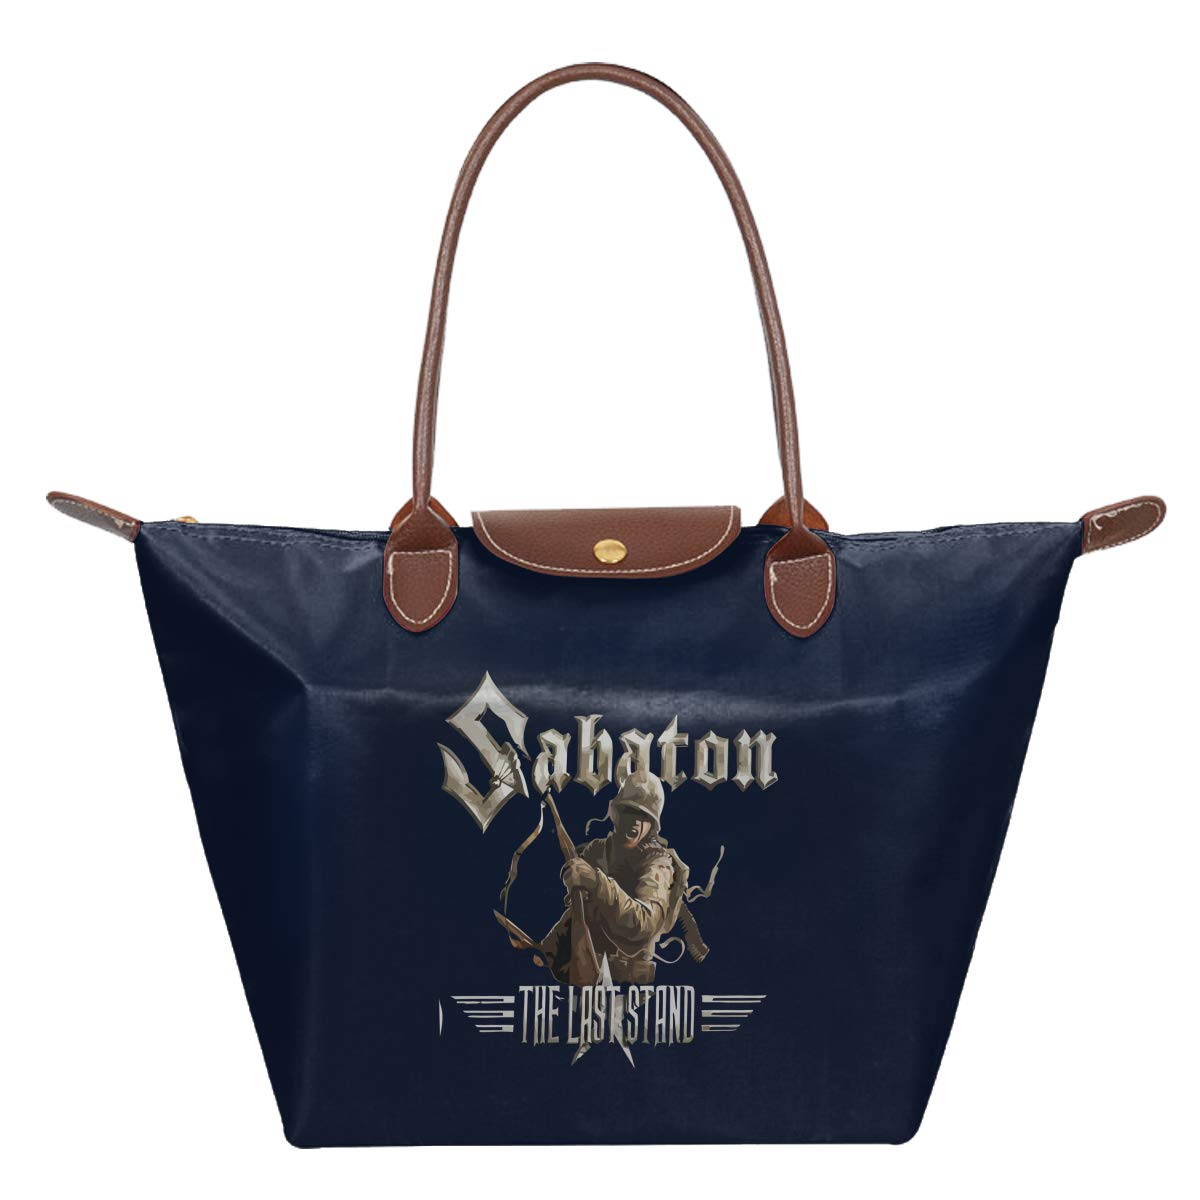 Sabaton The Last Stand Waterproof Leather Folded Messenger Nylon Bag Travel Tote Hopping Folding School Handbags